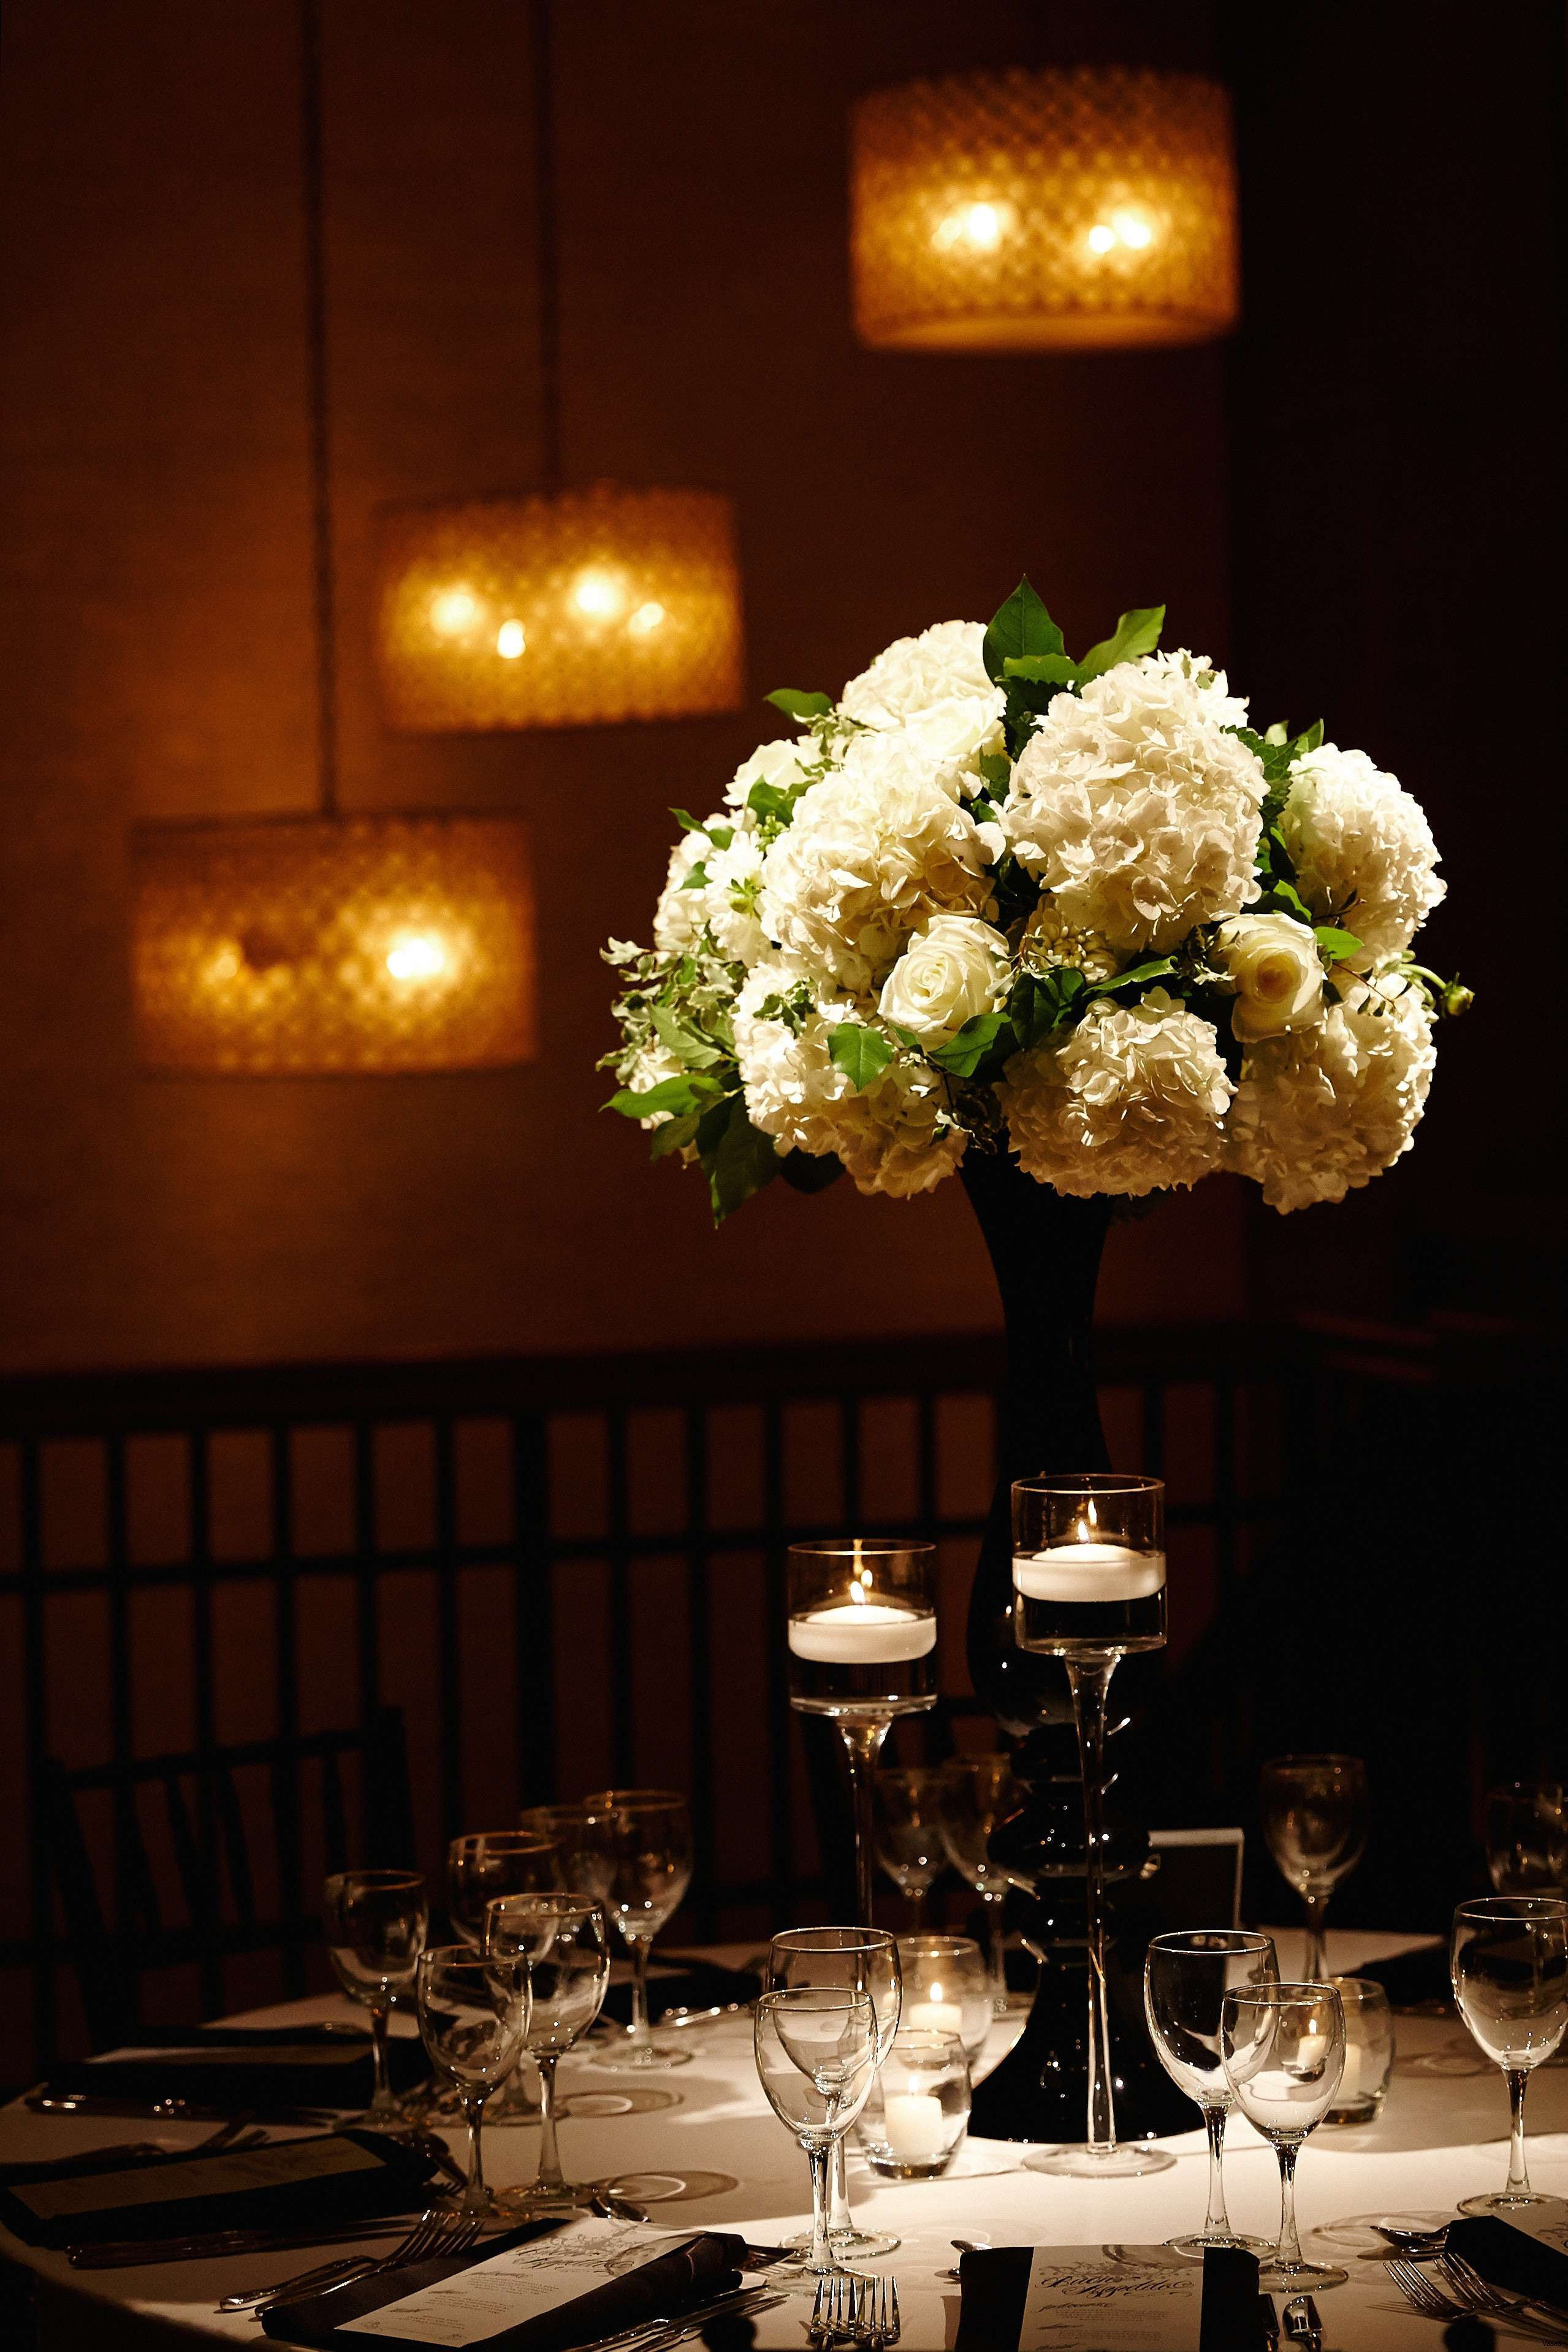 martini vases for sale of 19 elegant small decorative vases bogekompresorturkiye com regarding il fullxfull h vases black vase white flowers zoomi 0d with design design ideas vase